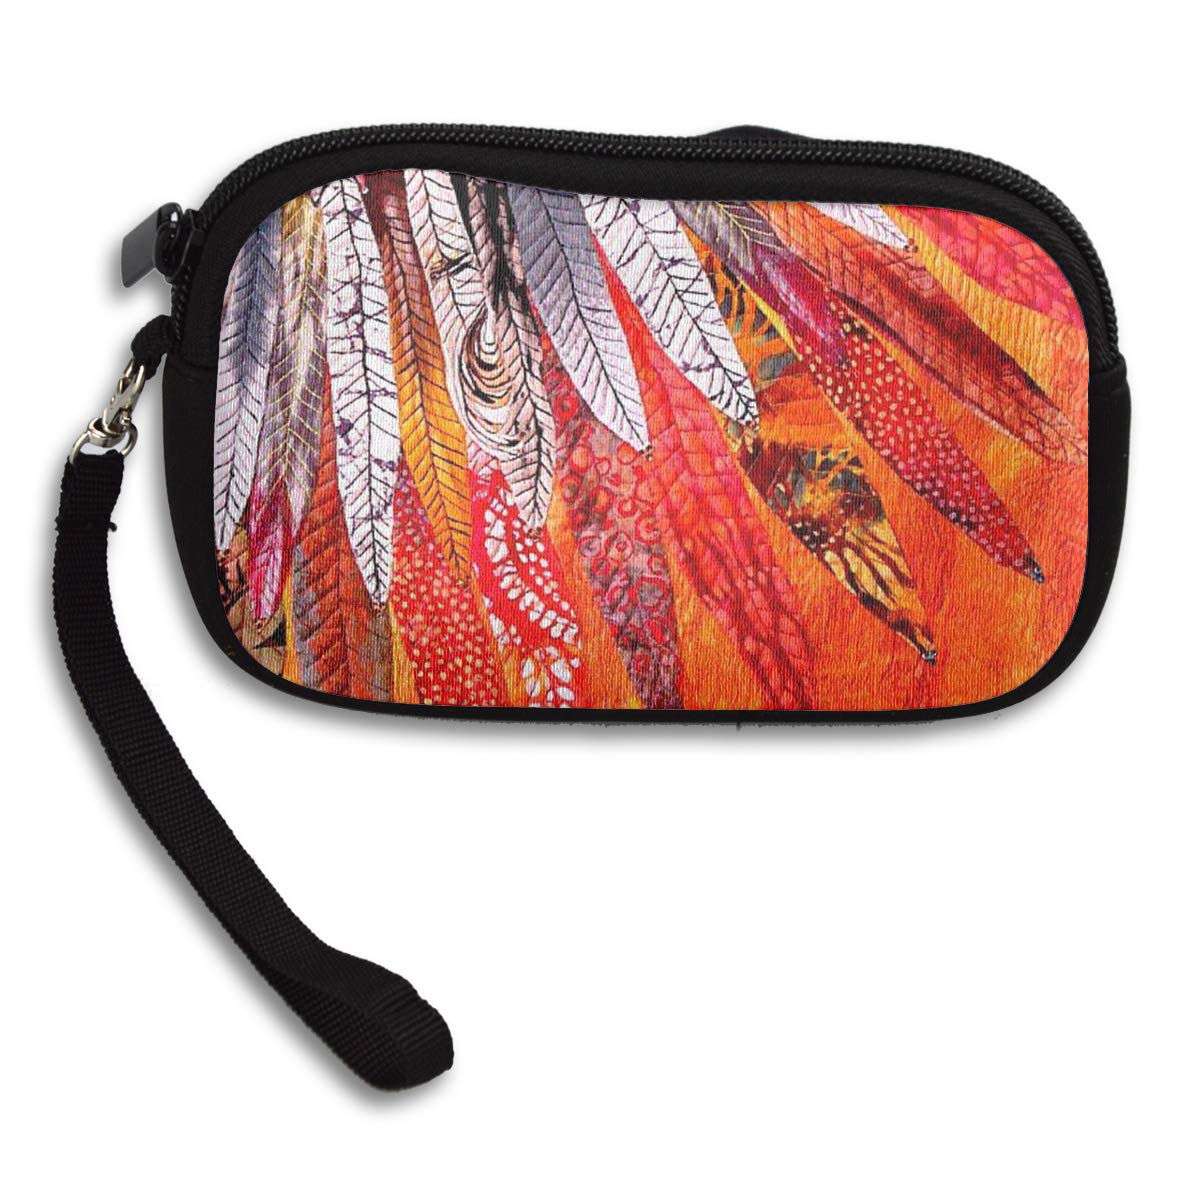 Fancy Dancer Indian Feather Coin Pouch Clutch Purse Wristlet Wallet Phone Card Holder Handbag